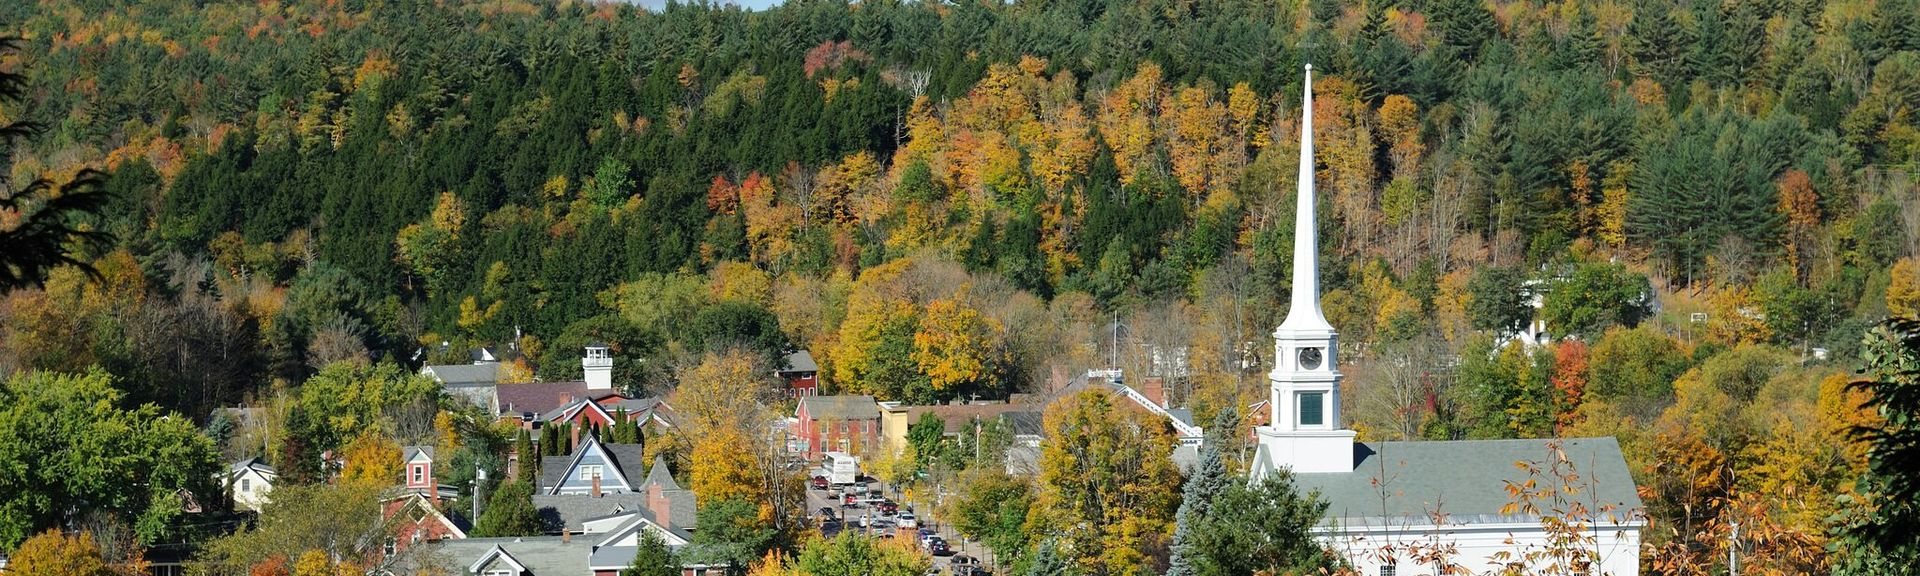 Stowe, VT, USA